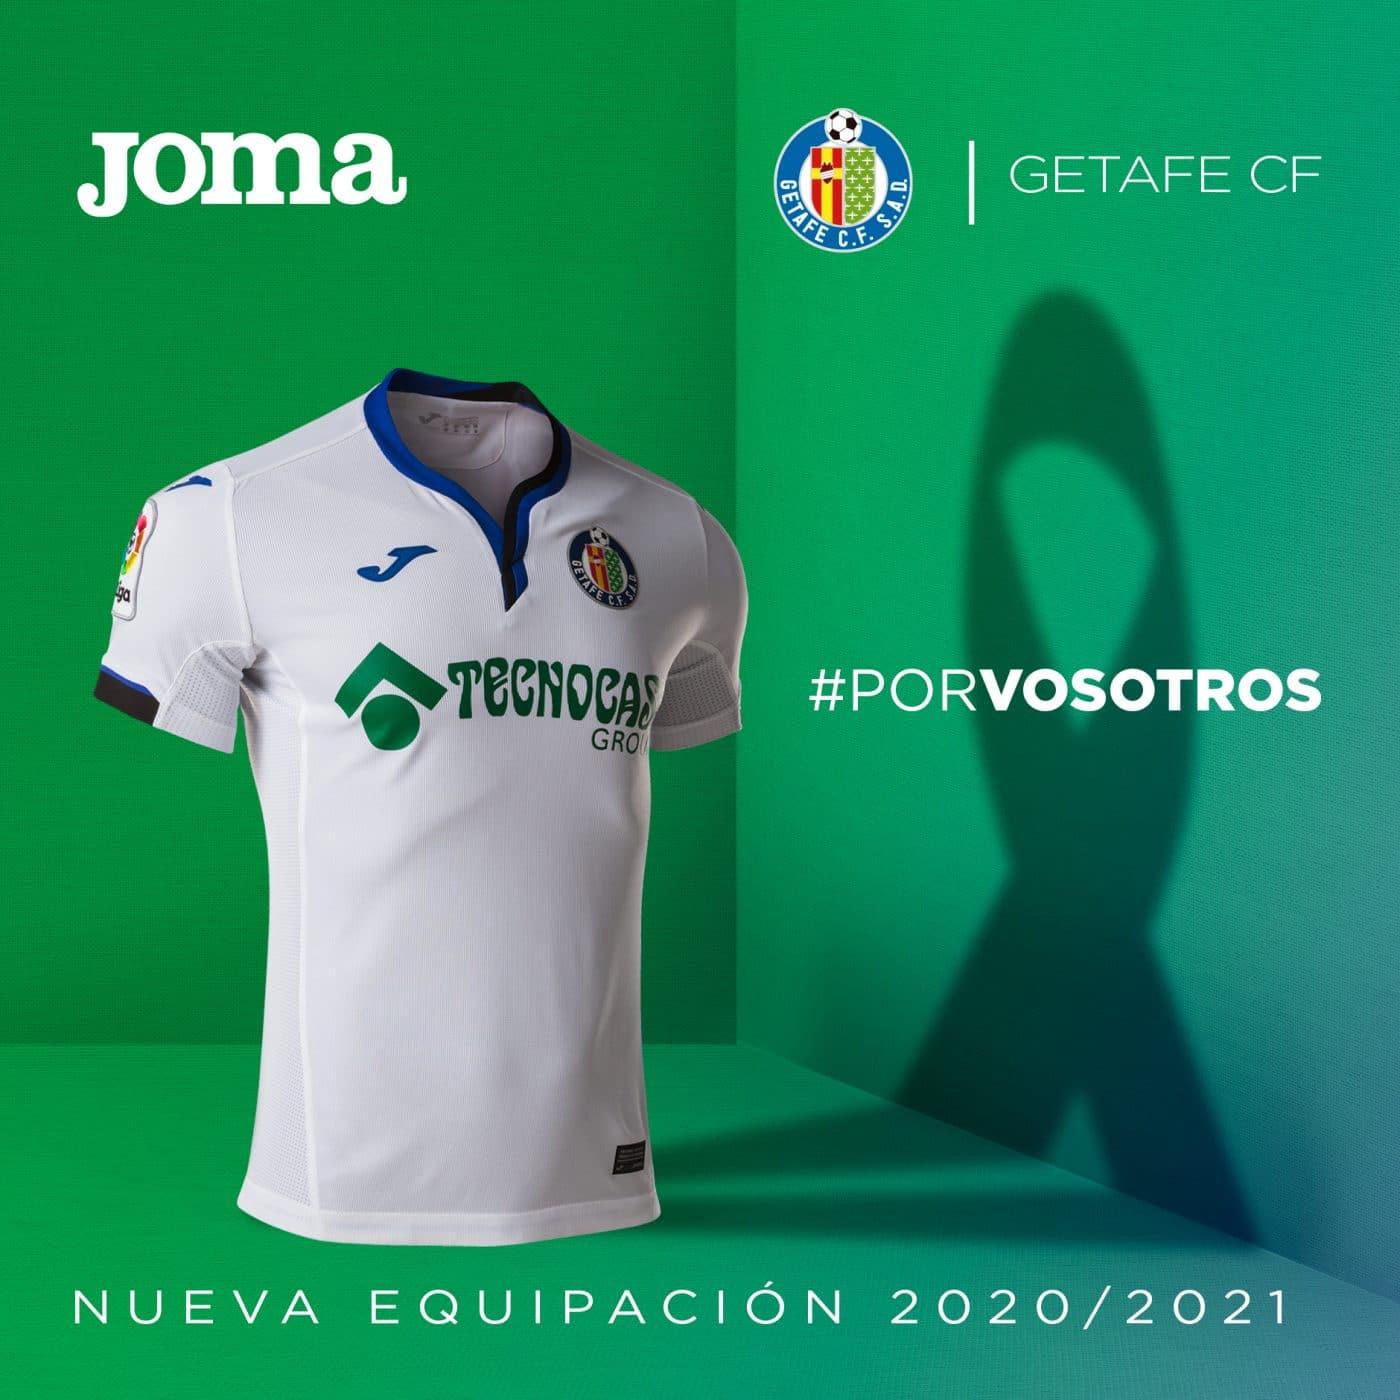 mailot-third-getafe-2020-2021-joma